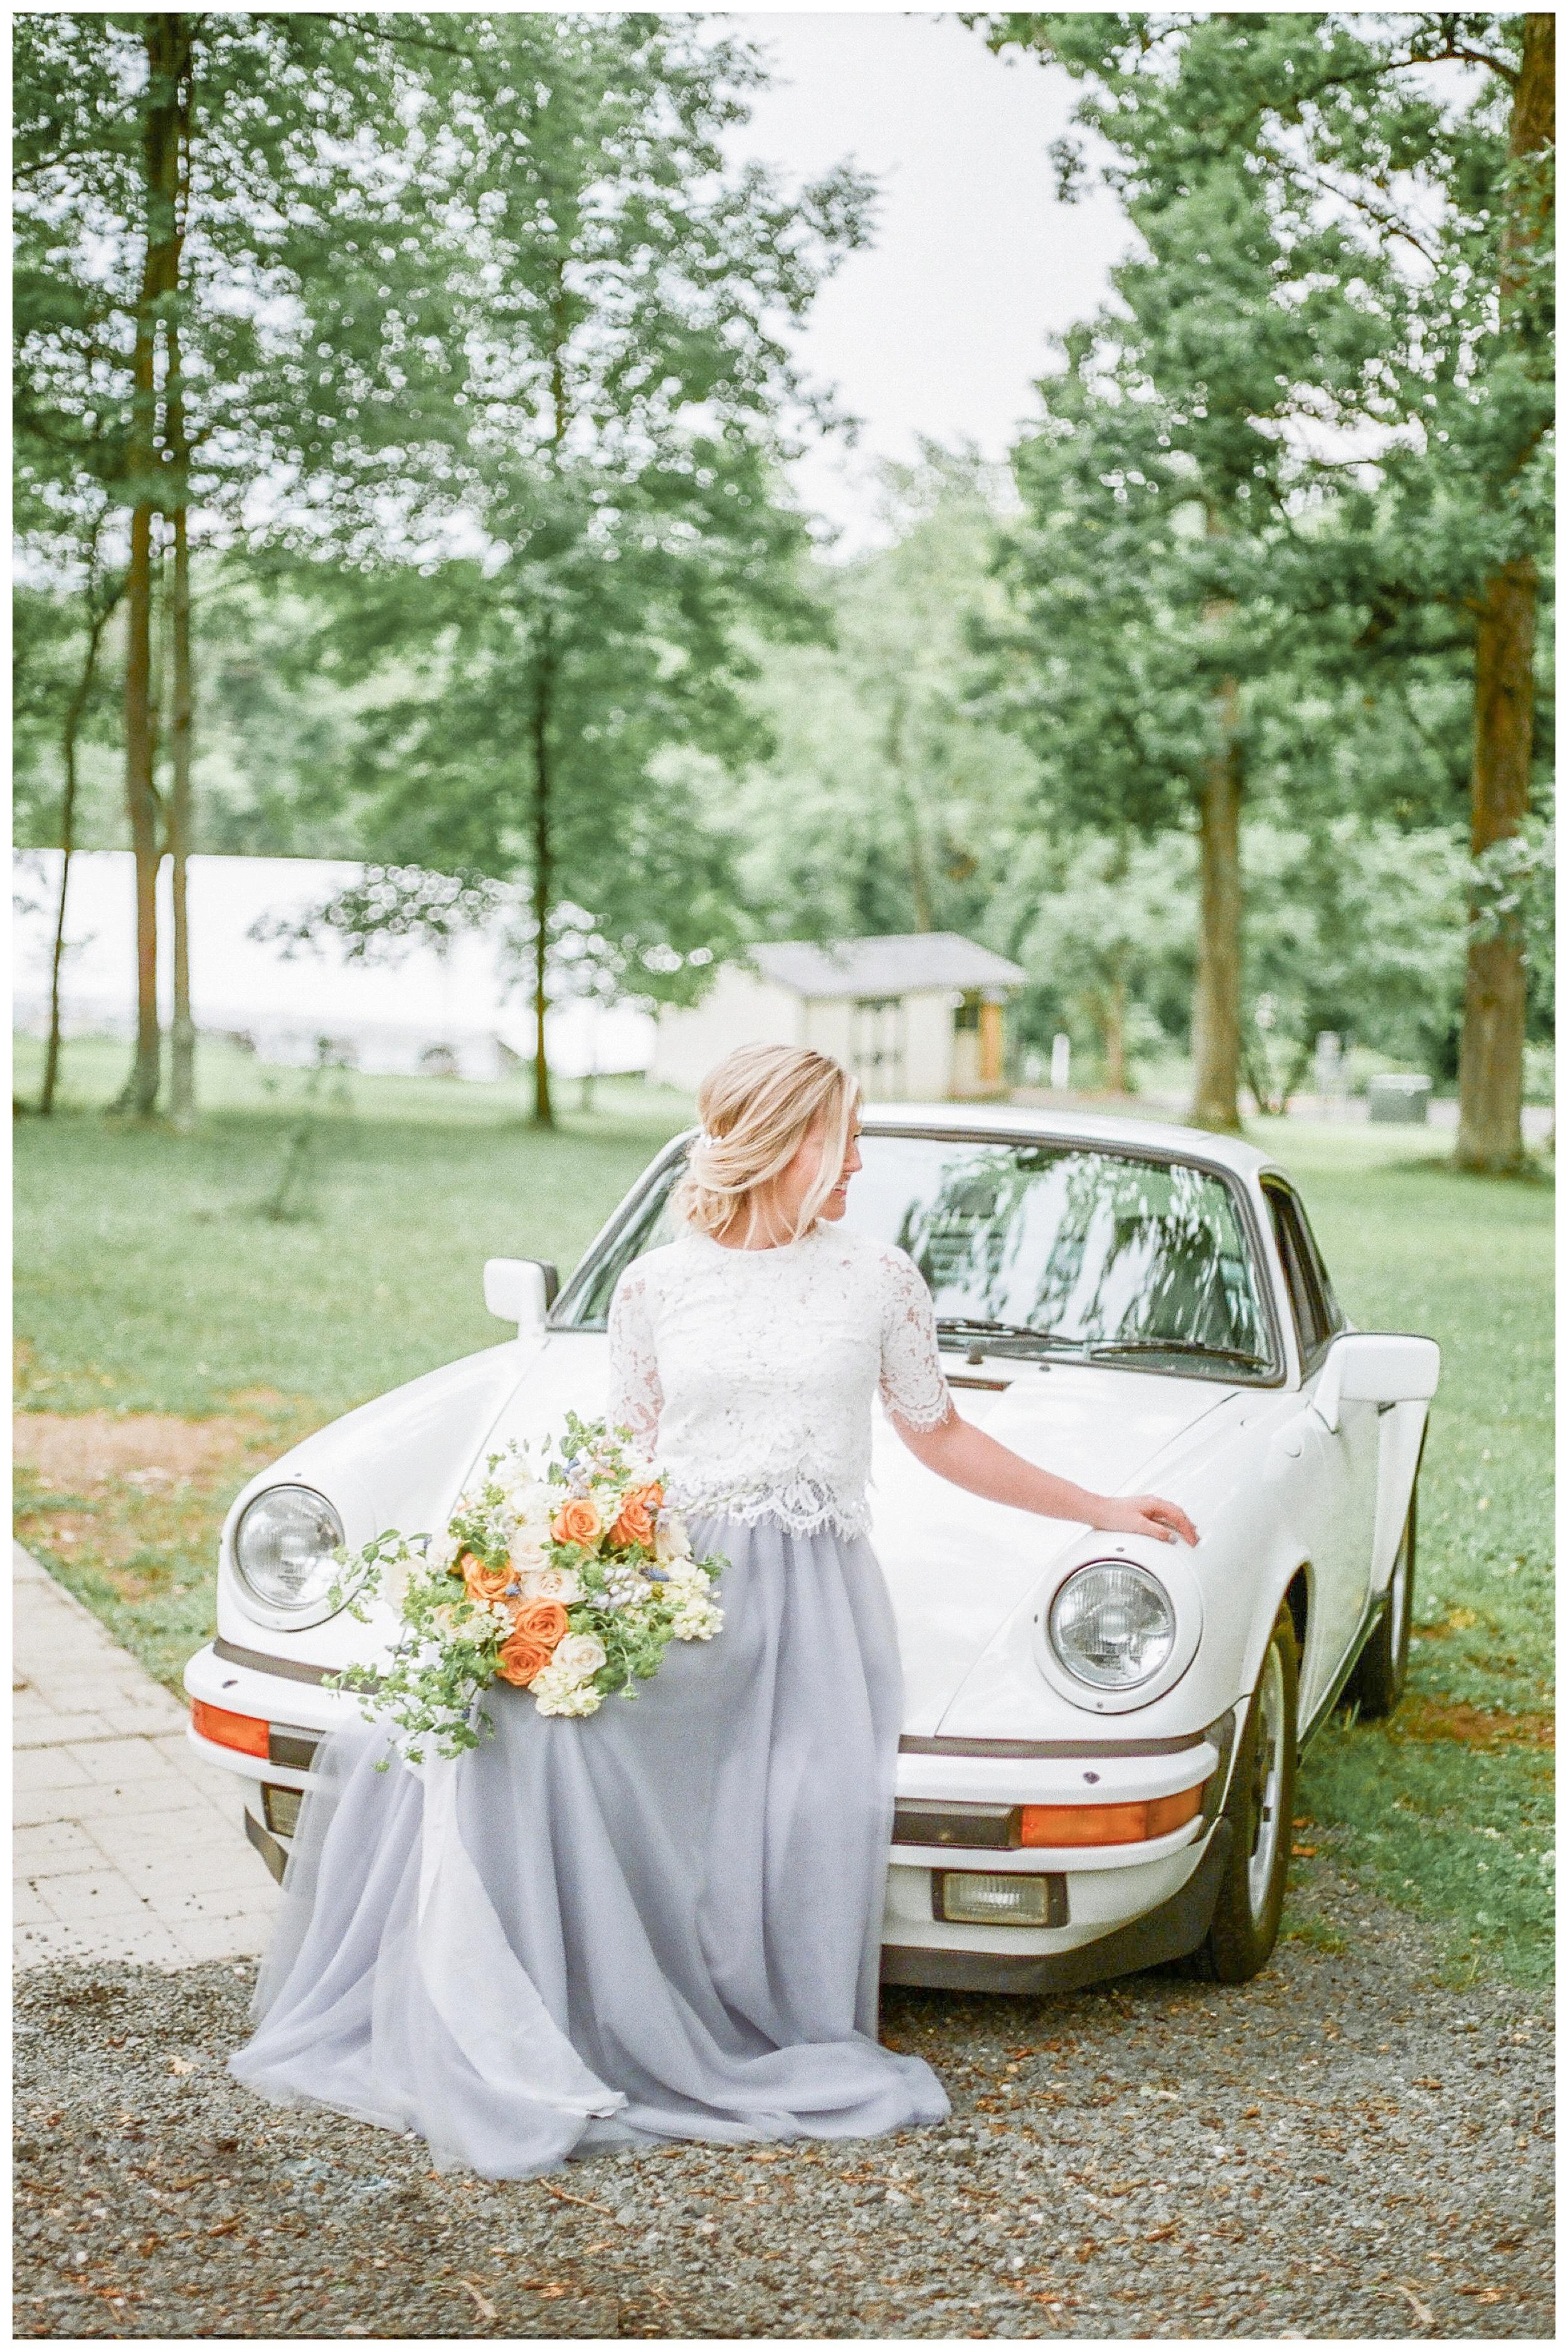 Rust Manor Wedding   Virginia Wedding Photographer Kir Tuben_0024.jpg